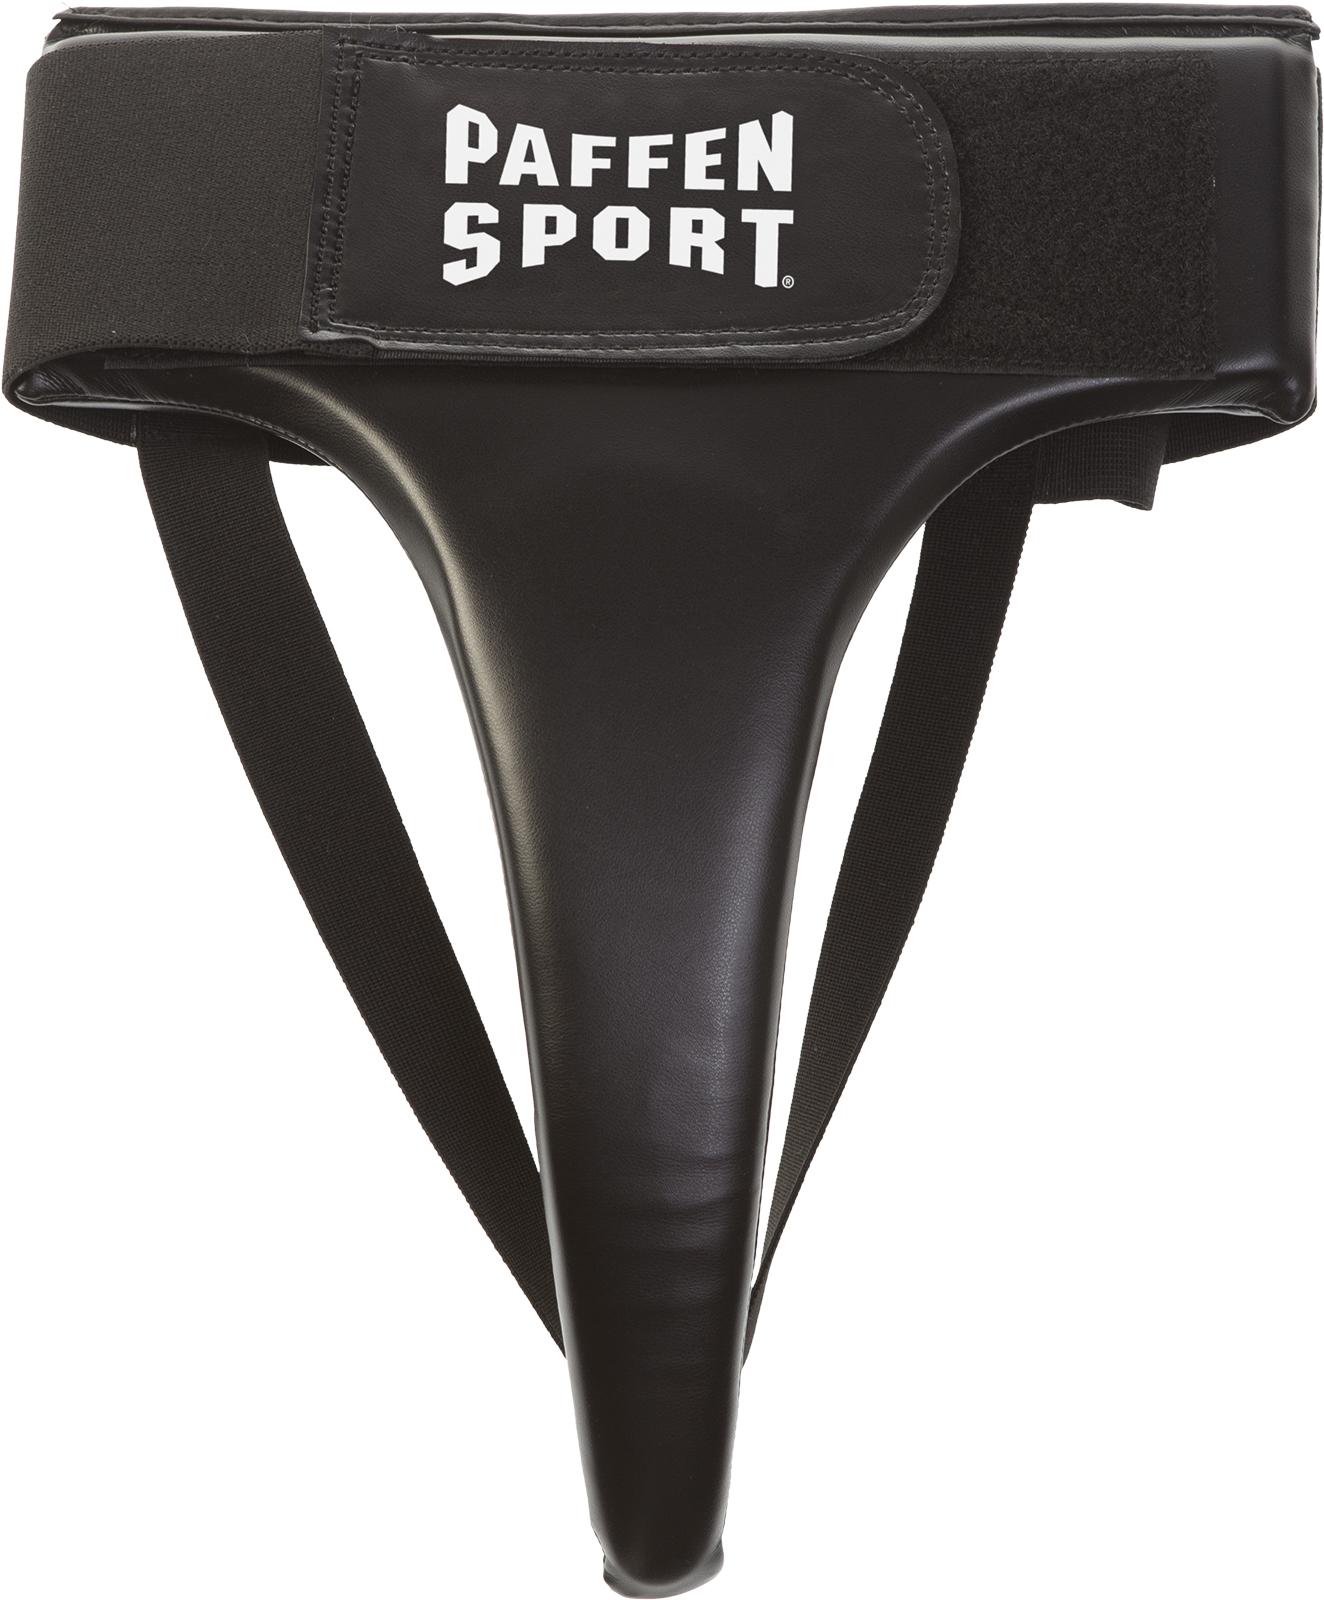 Женская защита паха  Paffen Sport